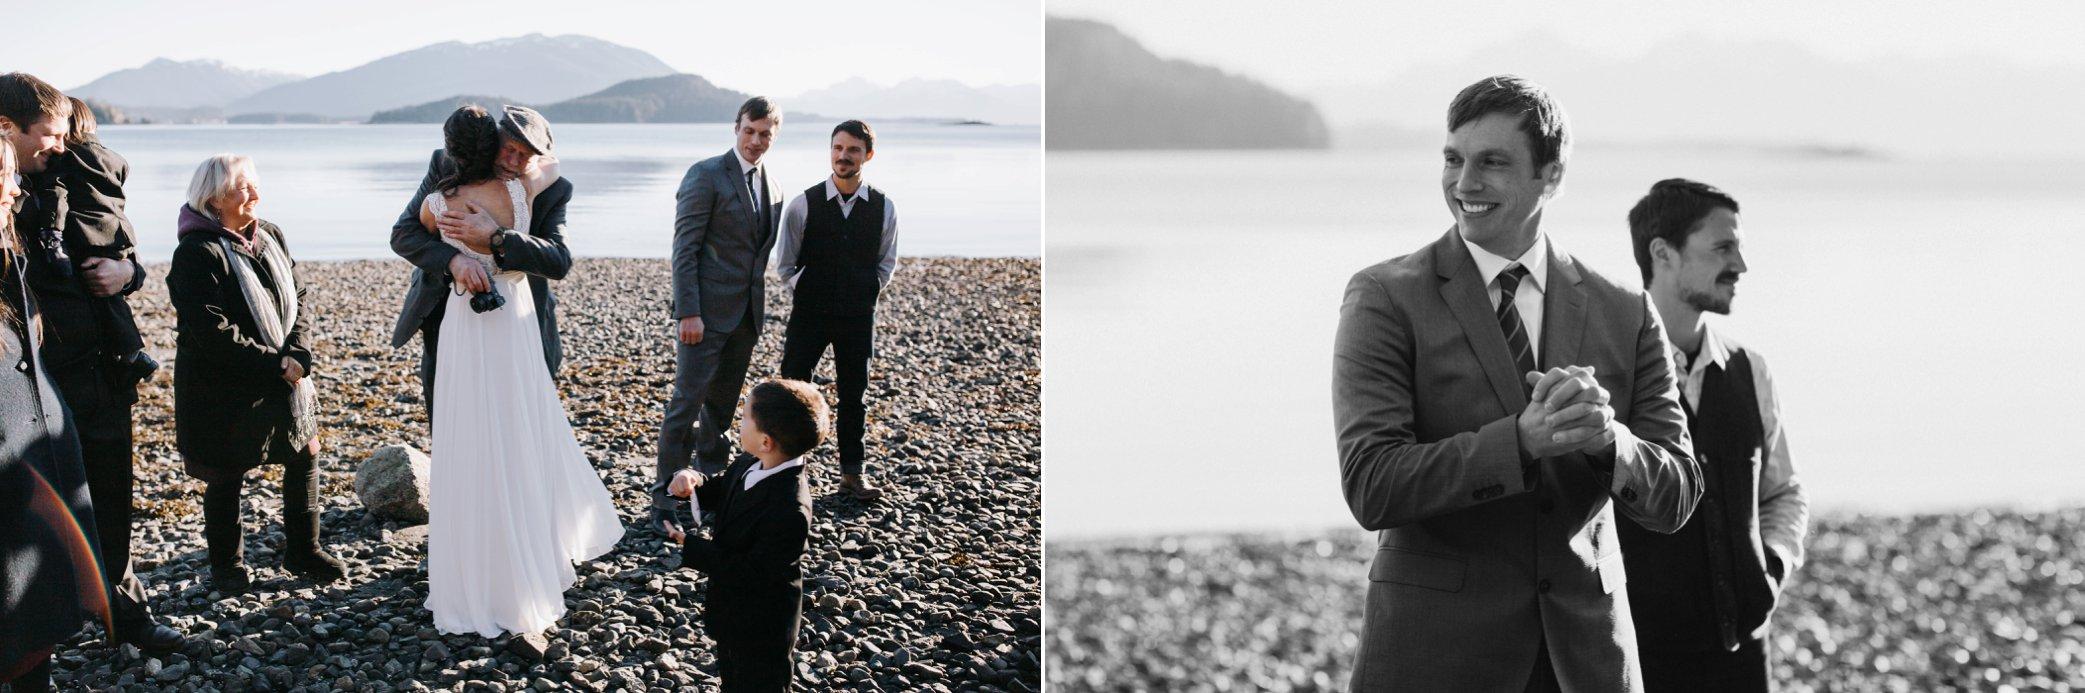 Juneau Wedding Photography